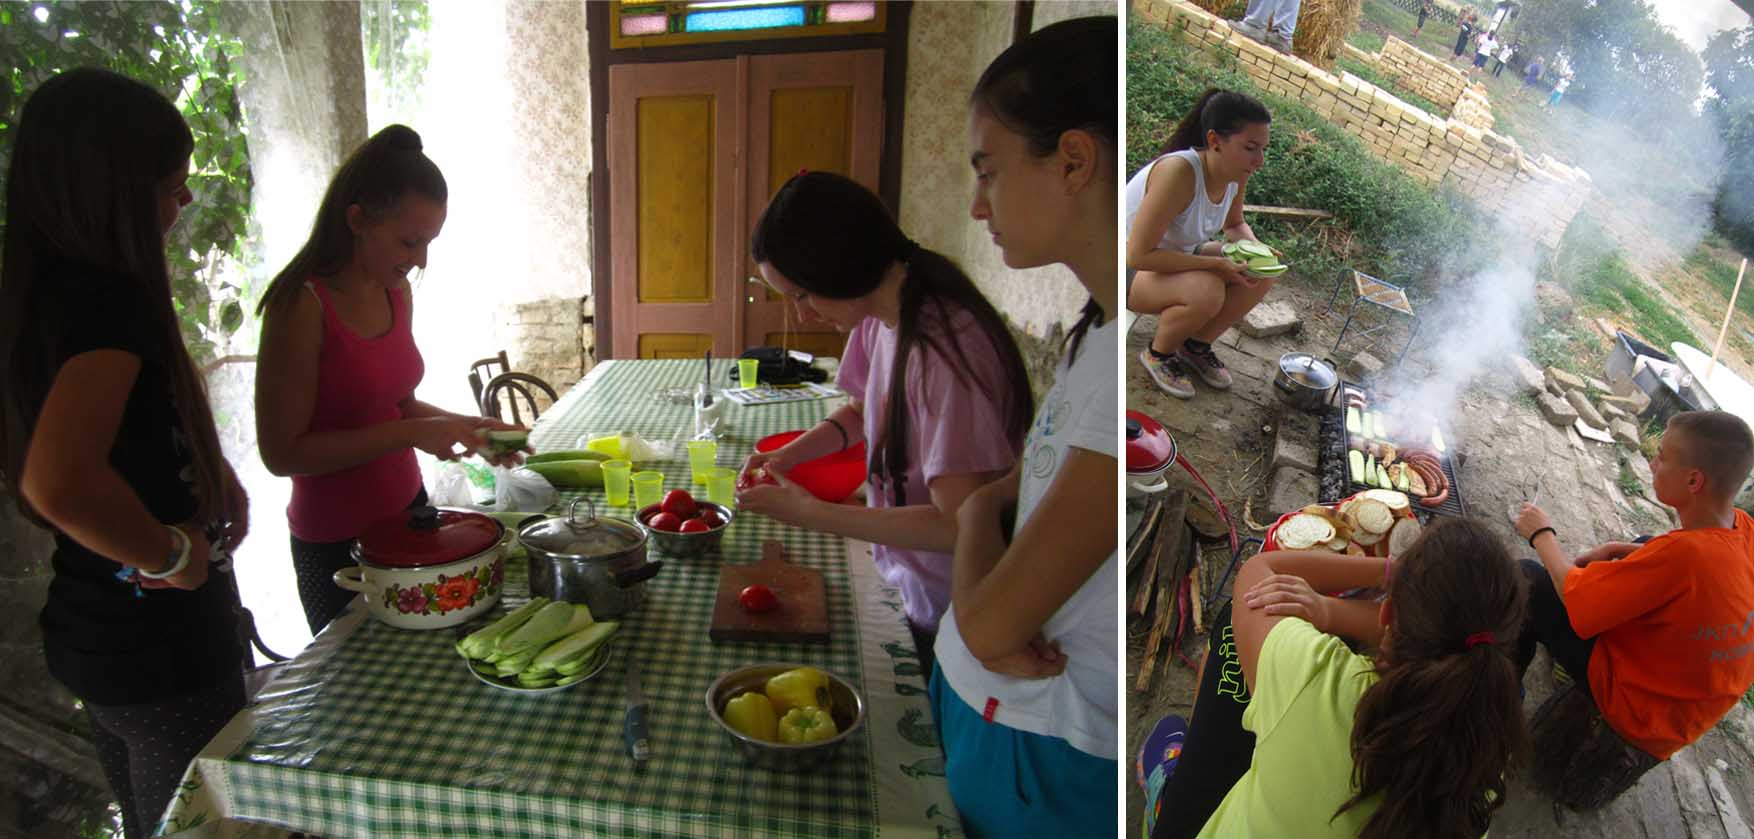 11 kamp zemljane gradnje II rostilj i salata